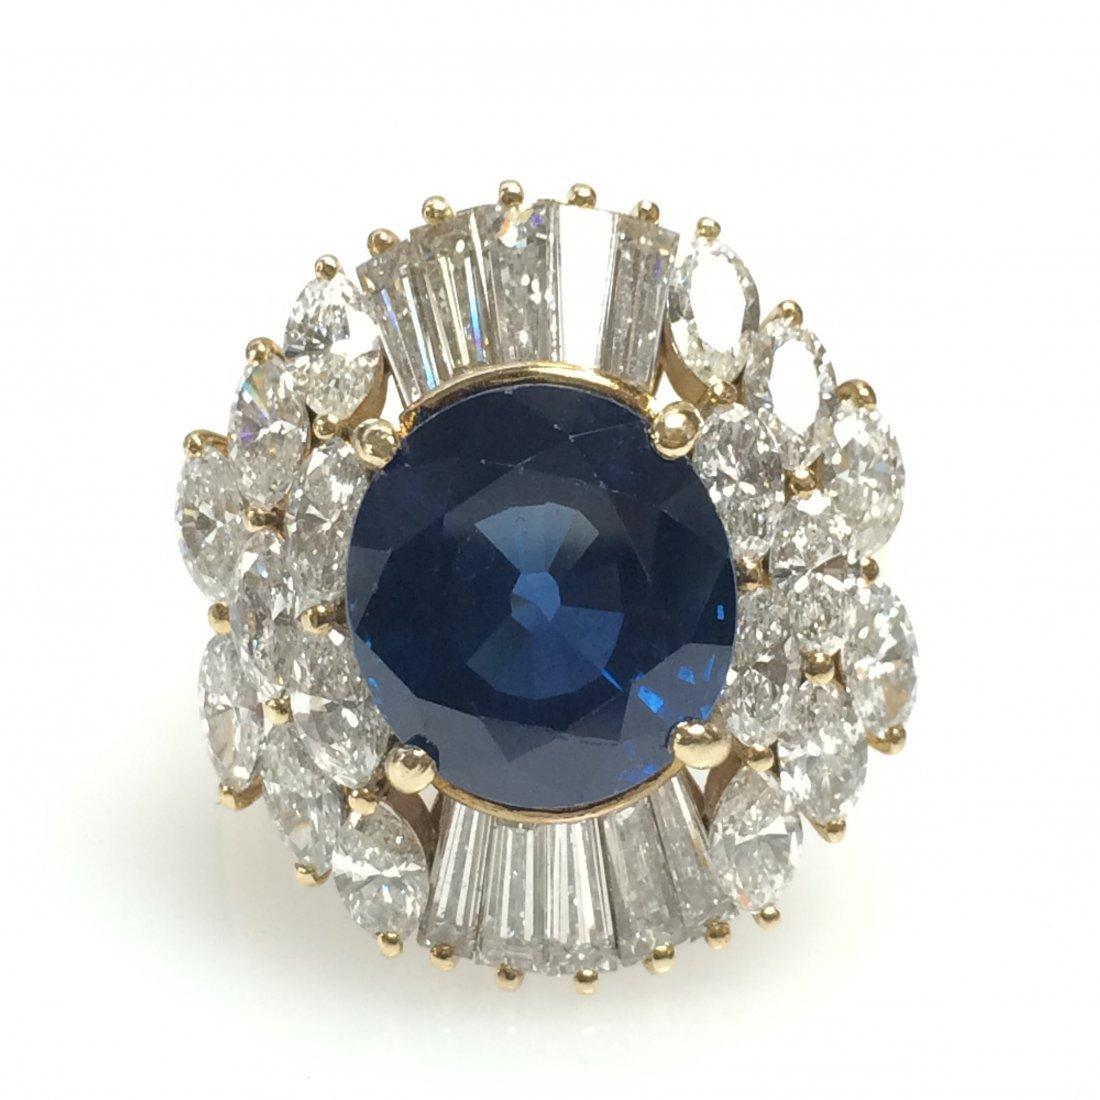 Sapphire and Diamond Ballerina Ring,18k Yellow Gold